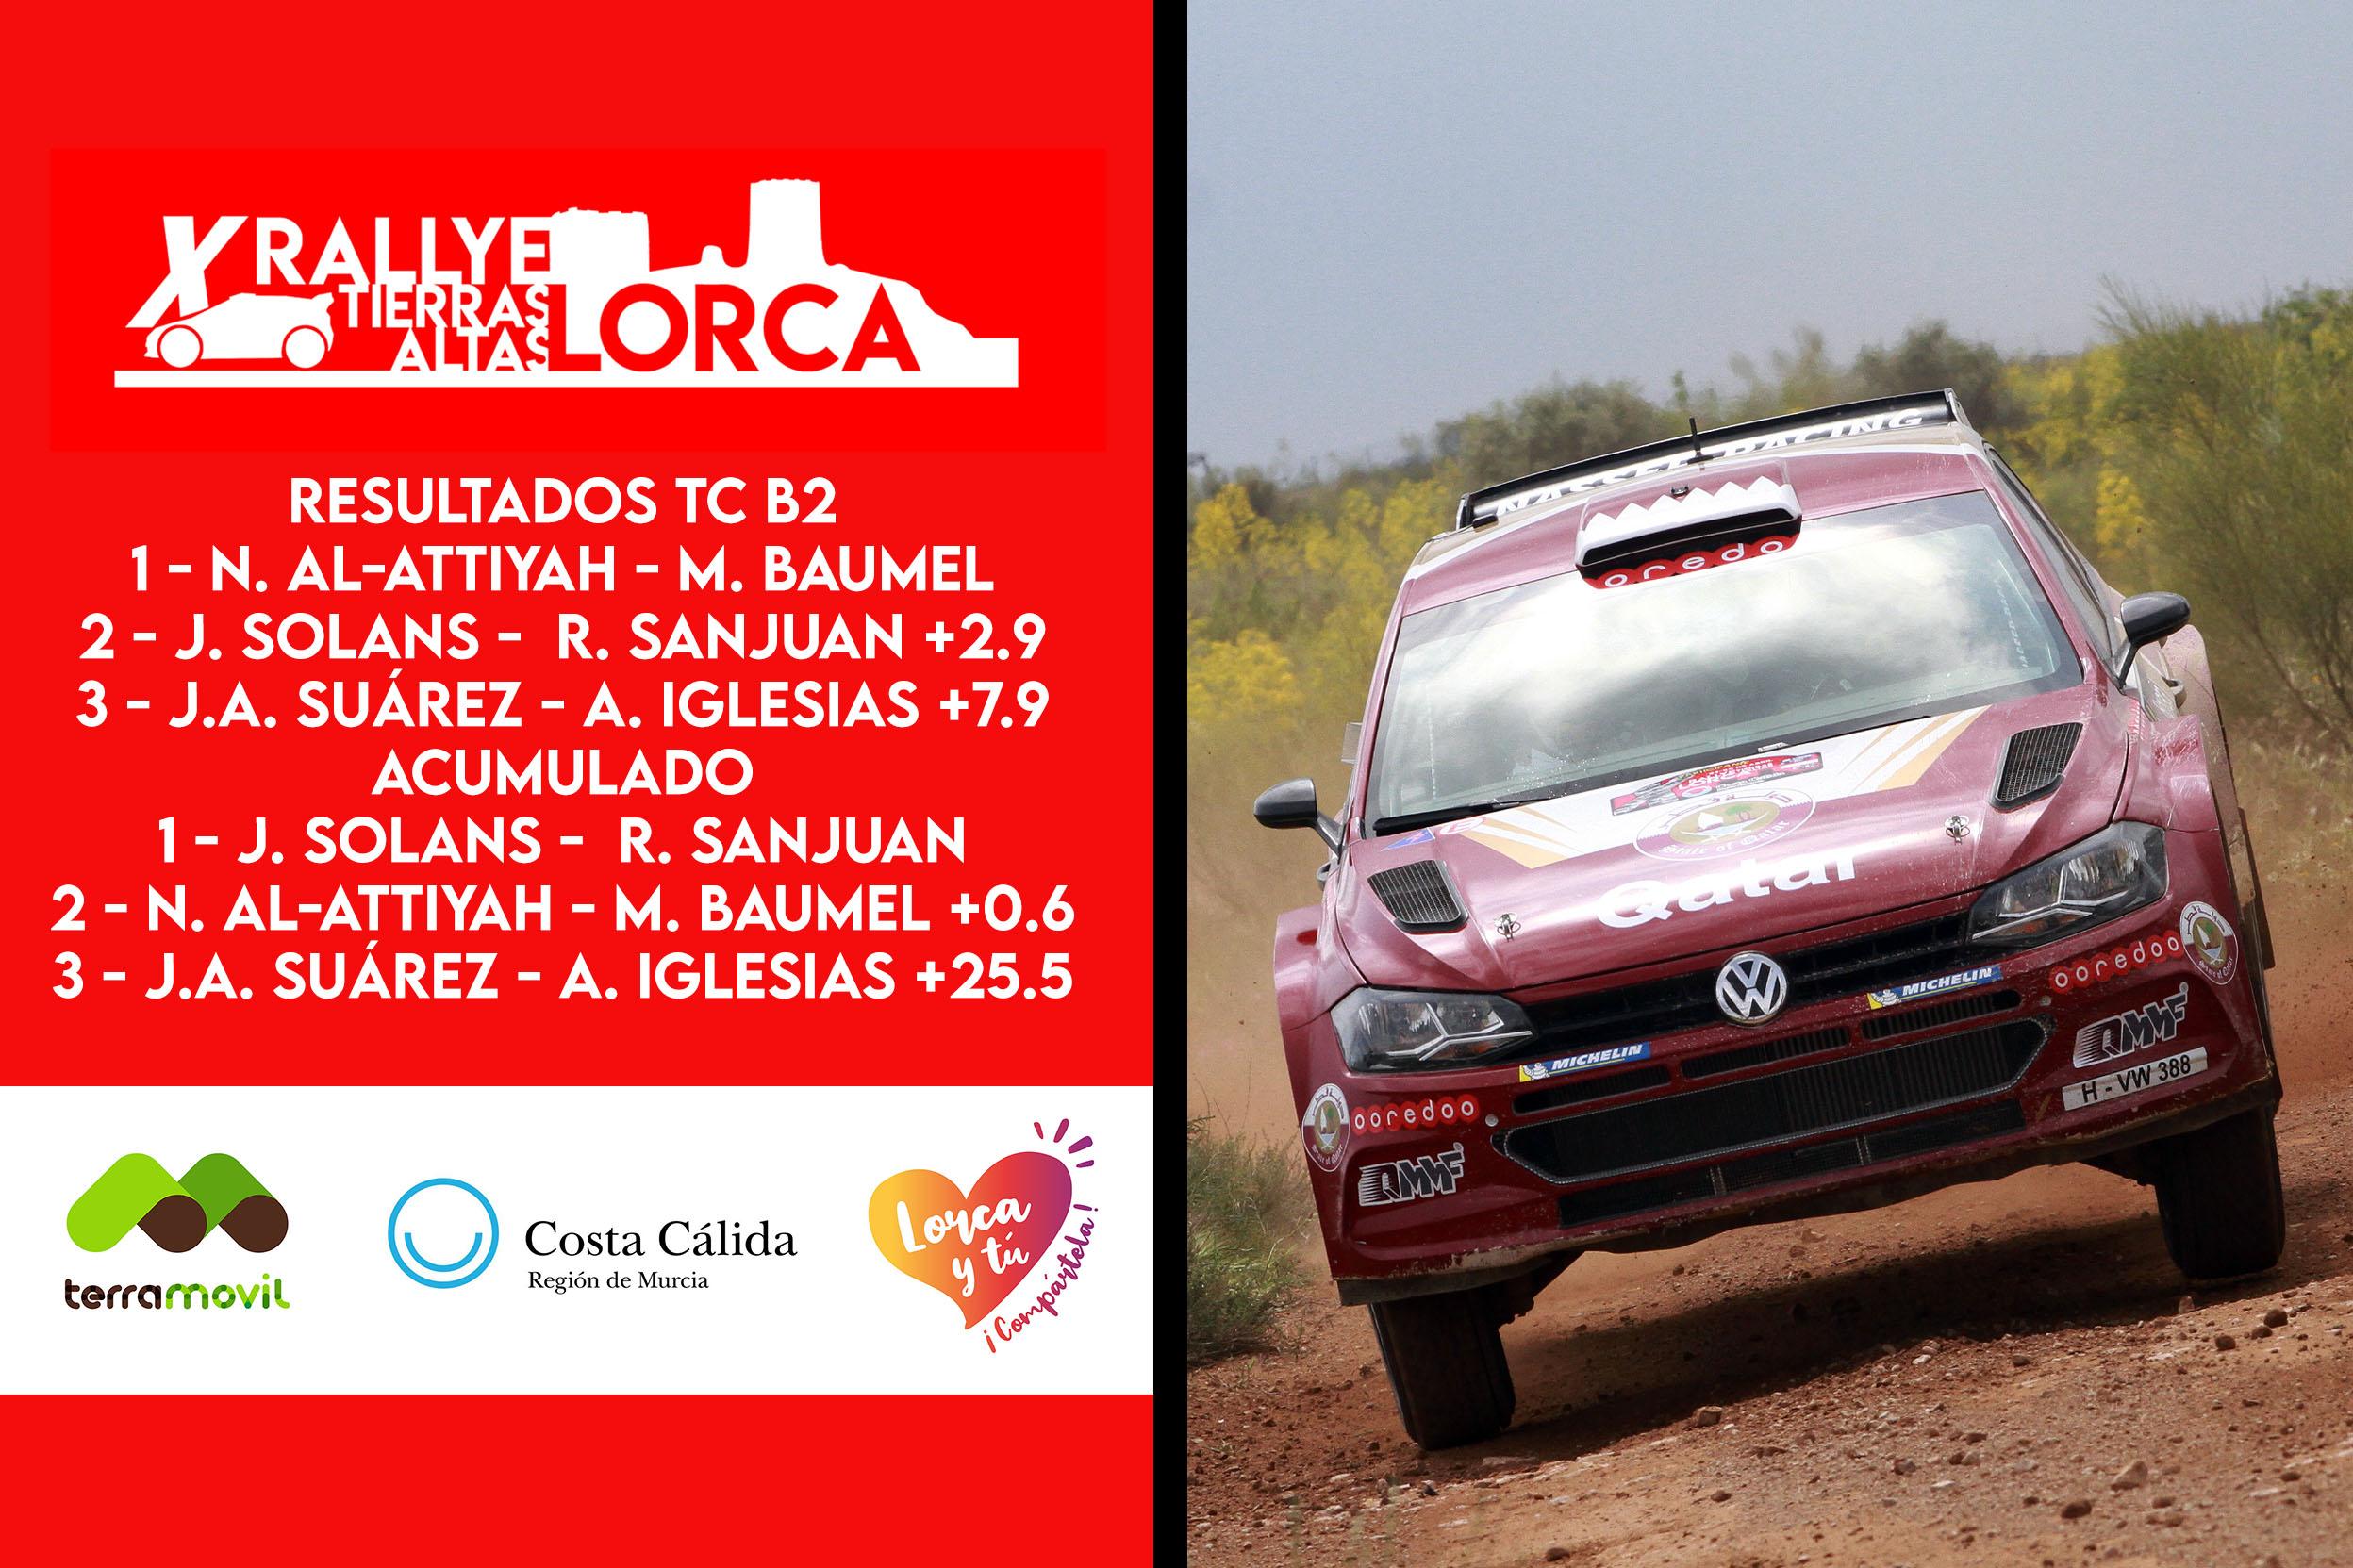 SCER + CERT: 10º Rallye Tierras Altas de Lorca [23-24 Abril] - Página 3 EzwKKDlXMAA4D3L?format=jpg&name=4096x4096